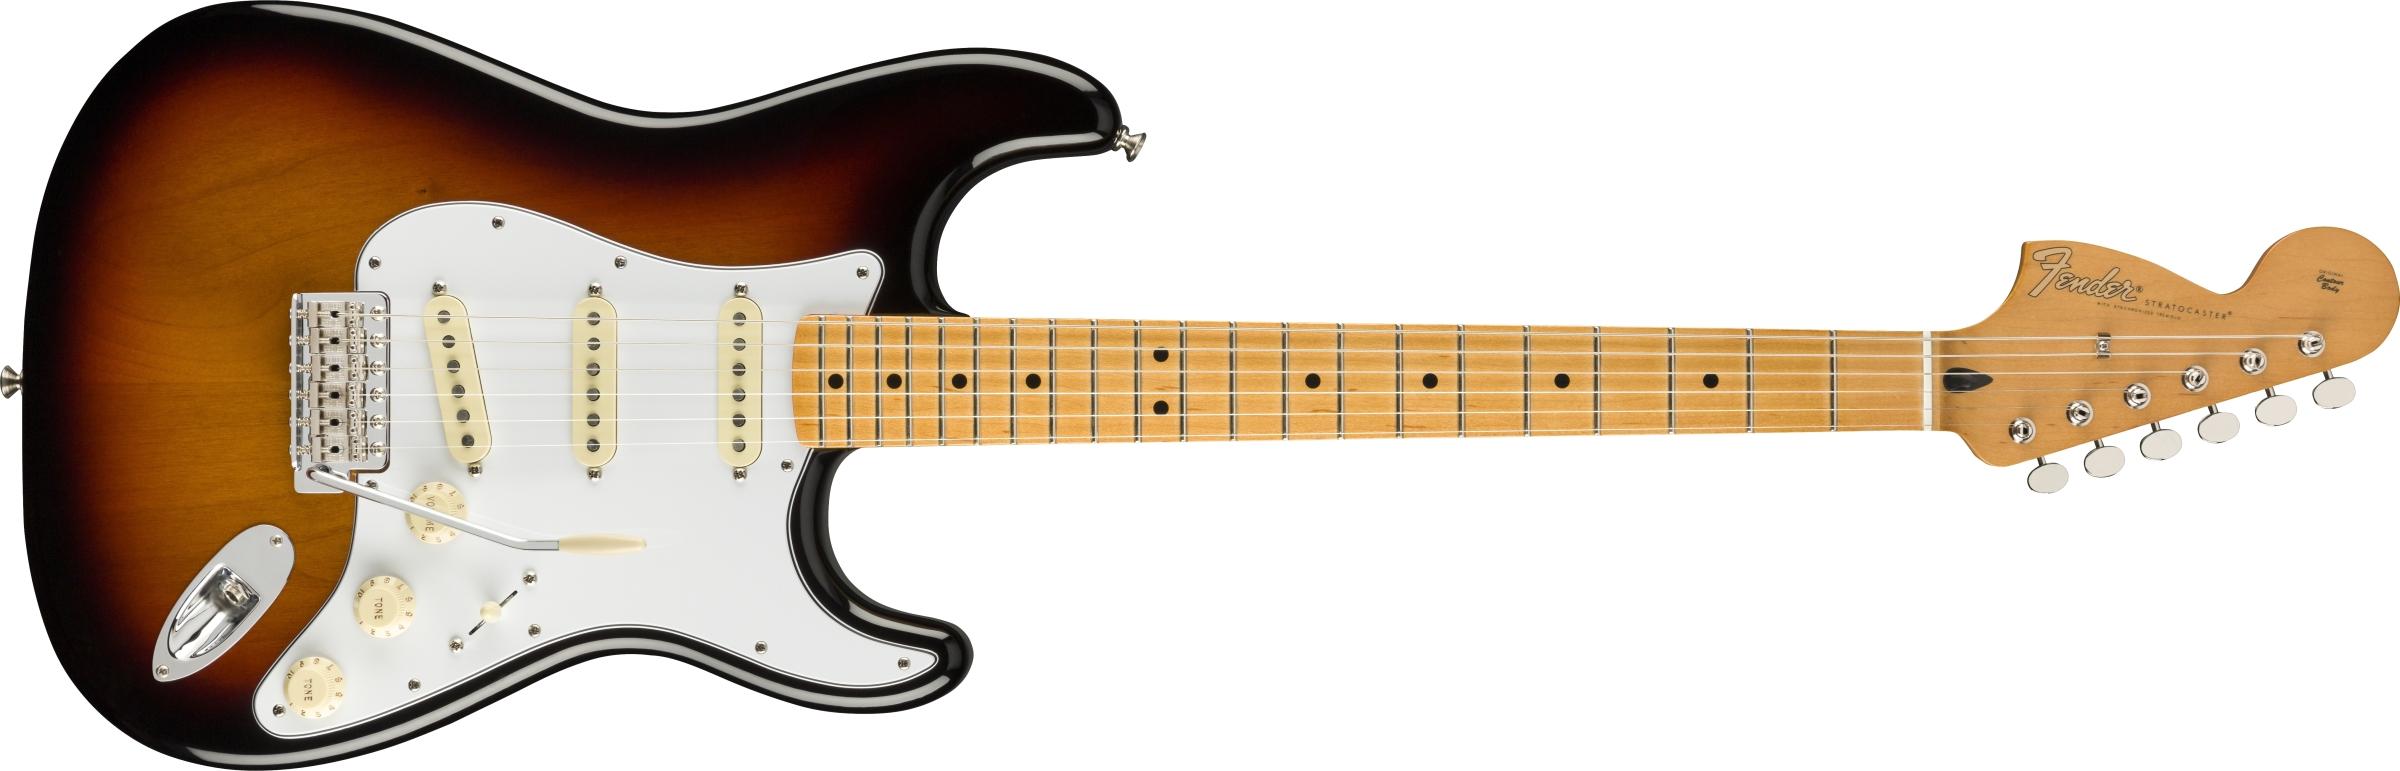 Fender Jimi Hendrix Model Stratocaster Strat OUTPUT JACK /& Plate Chrome